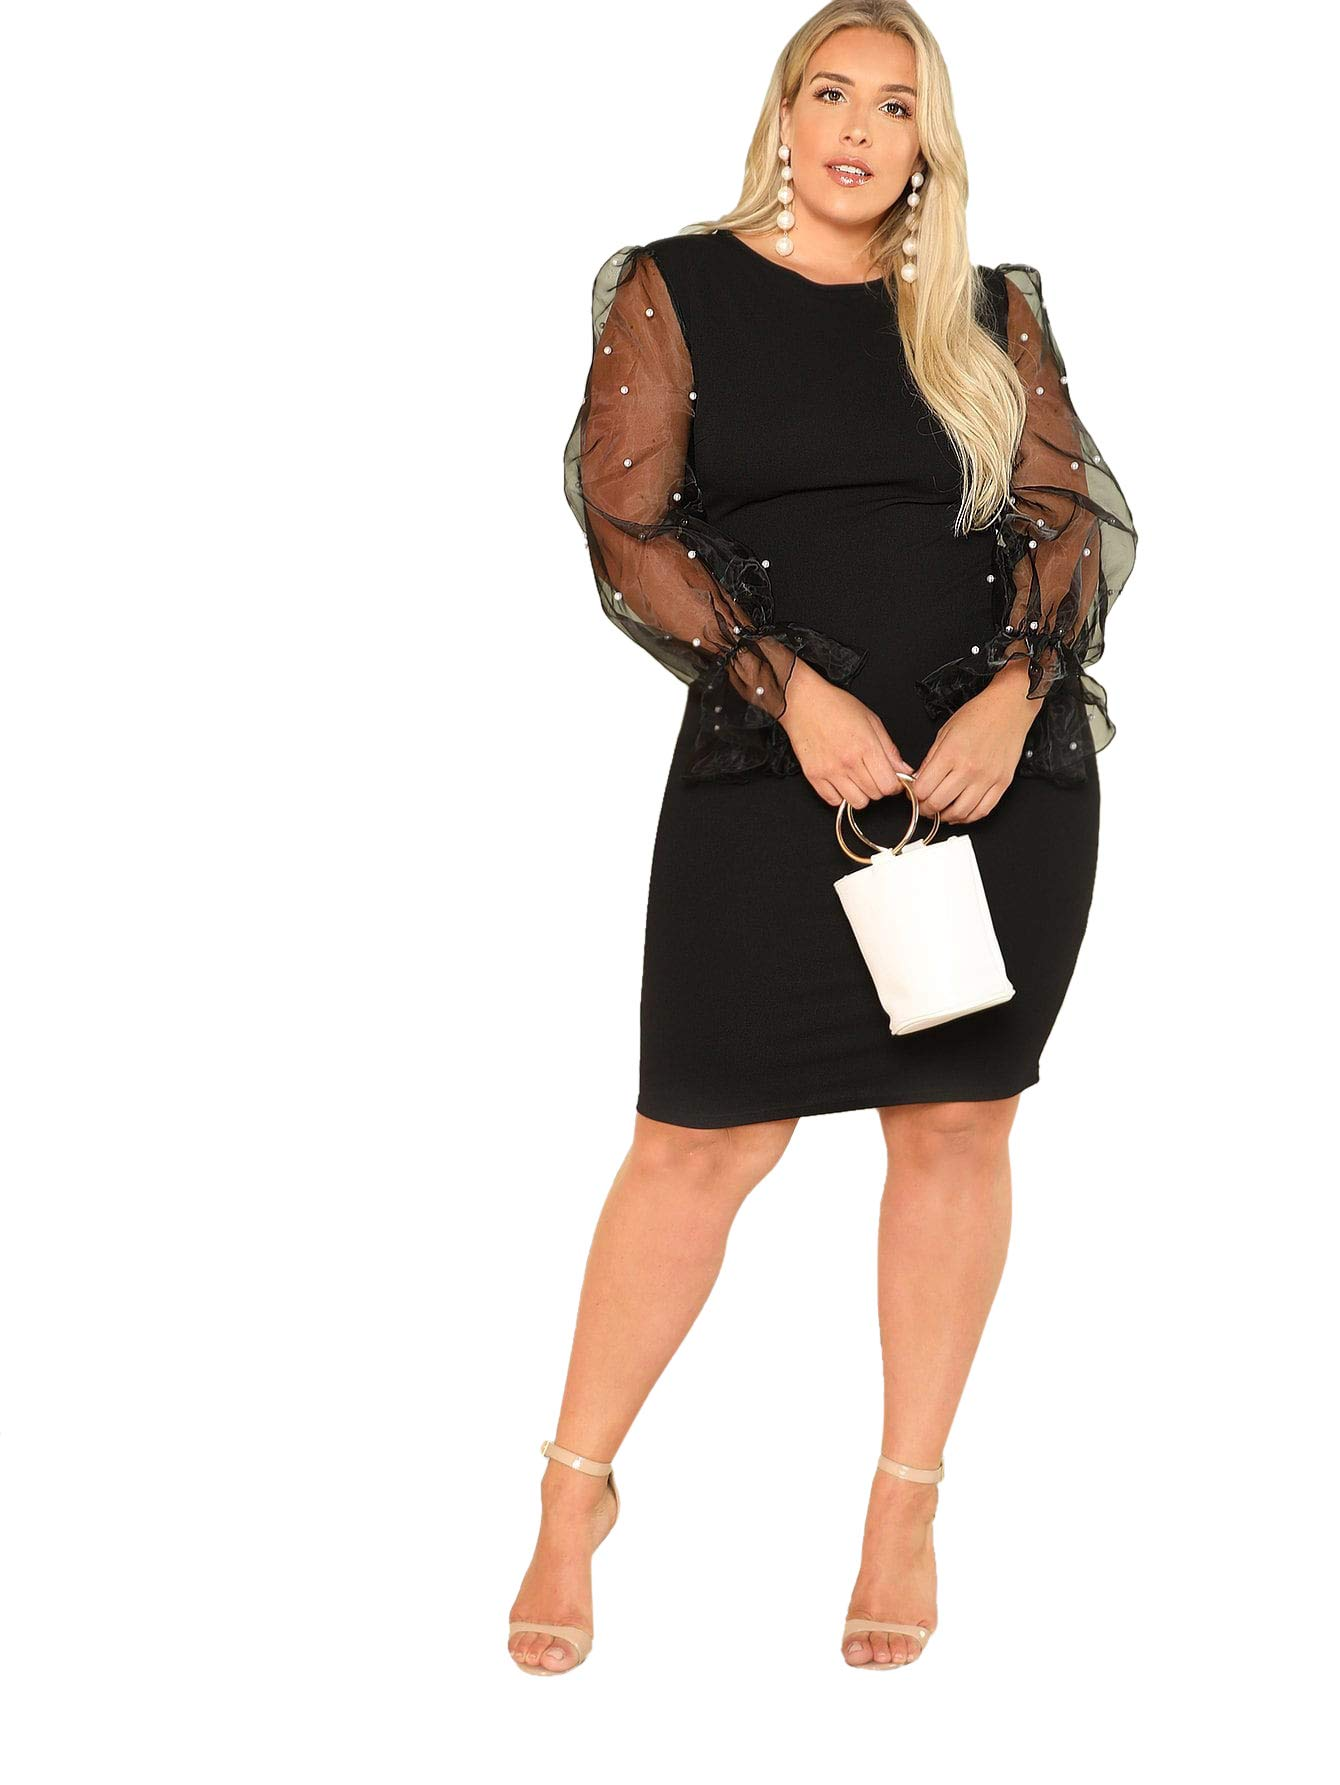 SheIn Womens Elegant Mesh Contrast Long Bishop Sleeve Bodycon Pencil Dress Black#2 X-Large